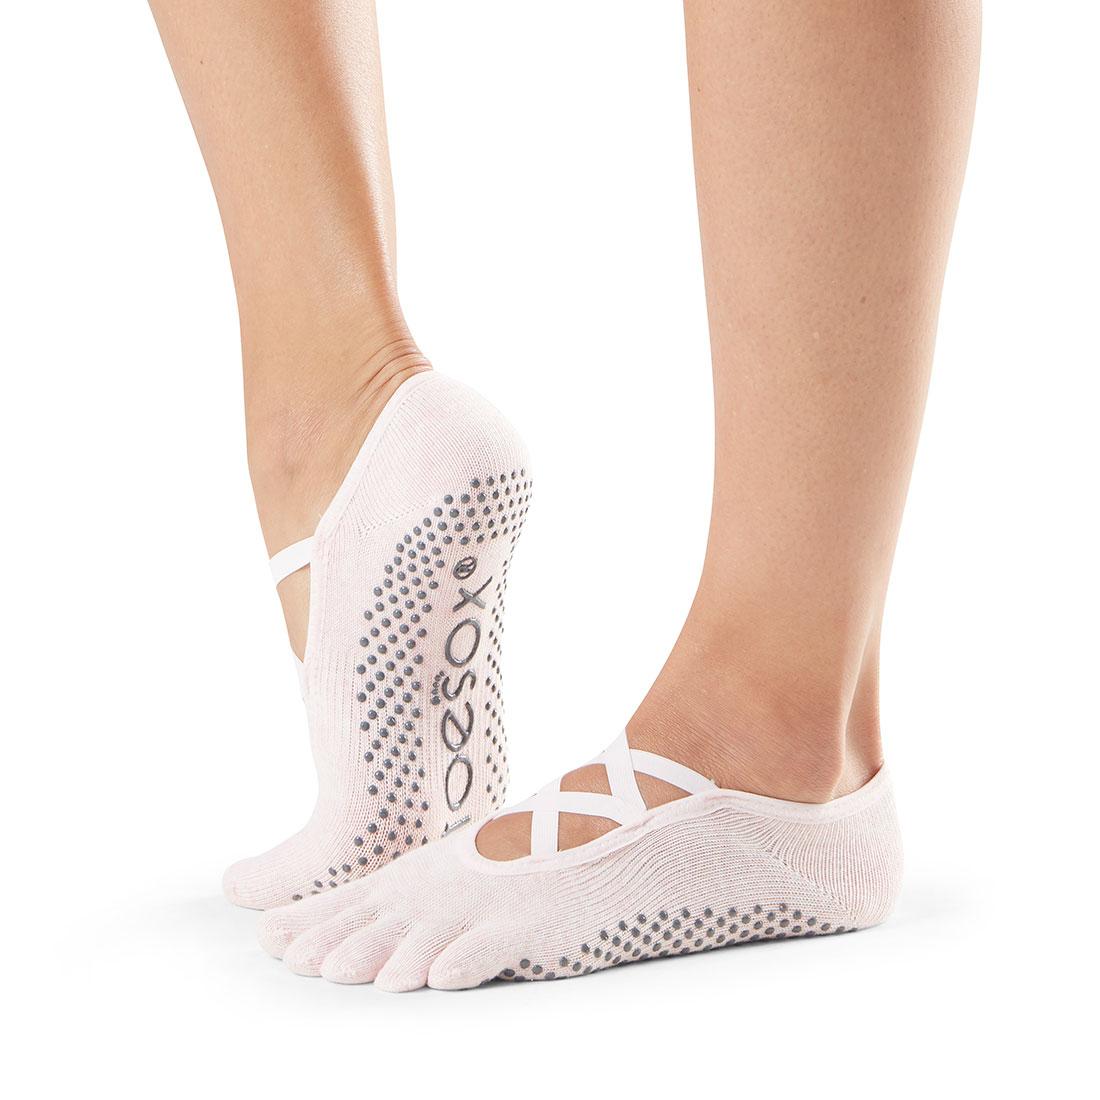 Yogasocken ToeSox Elle Full Toe Pink